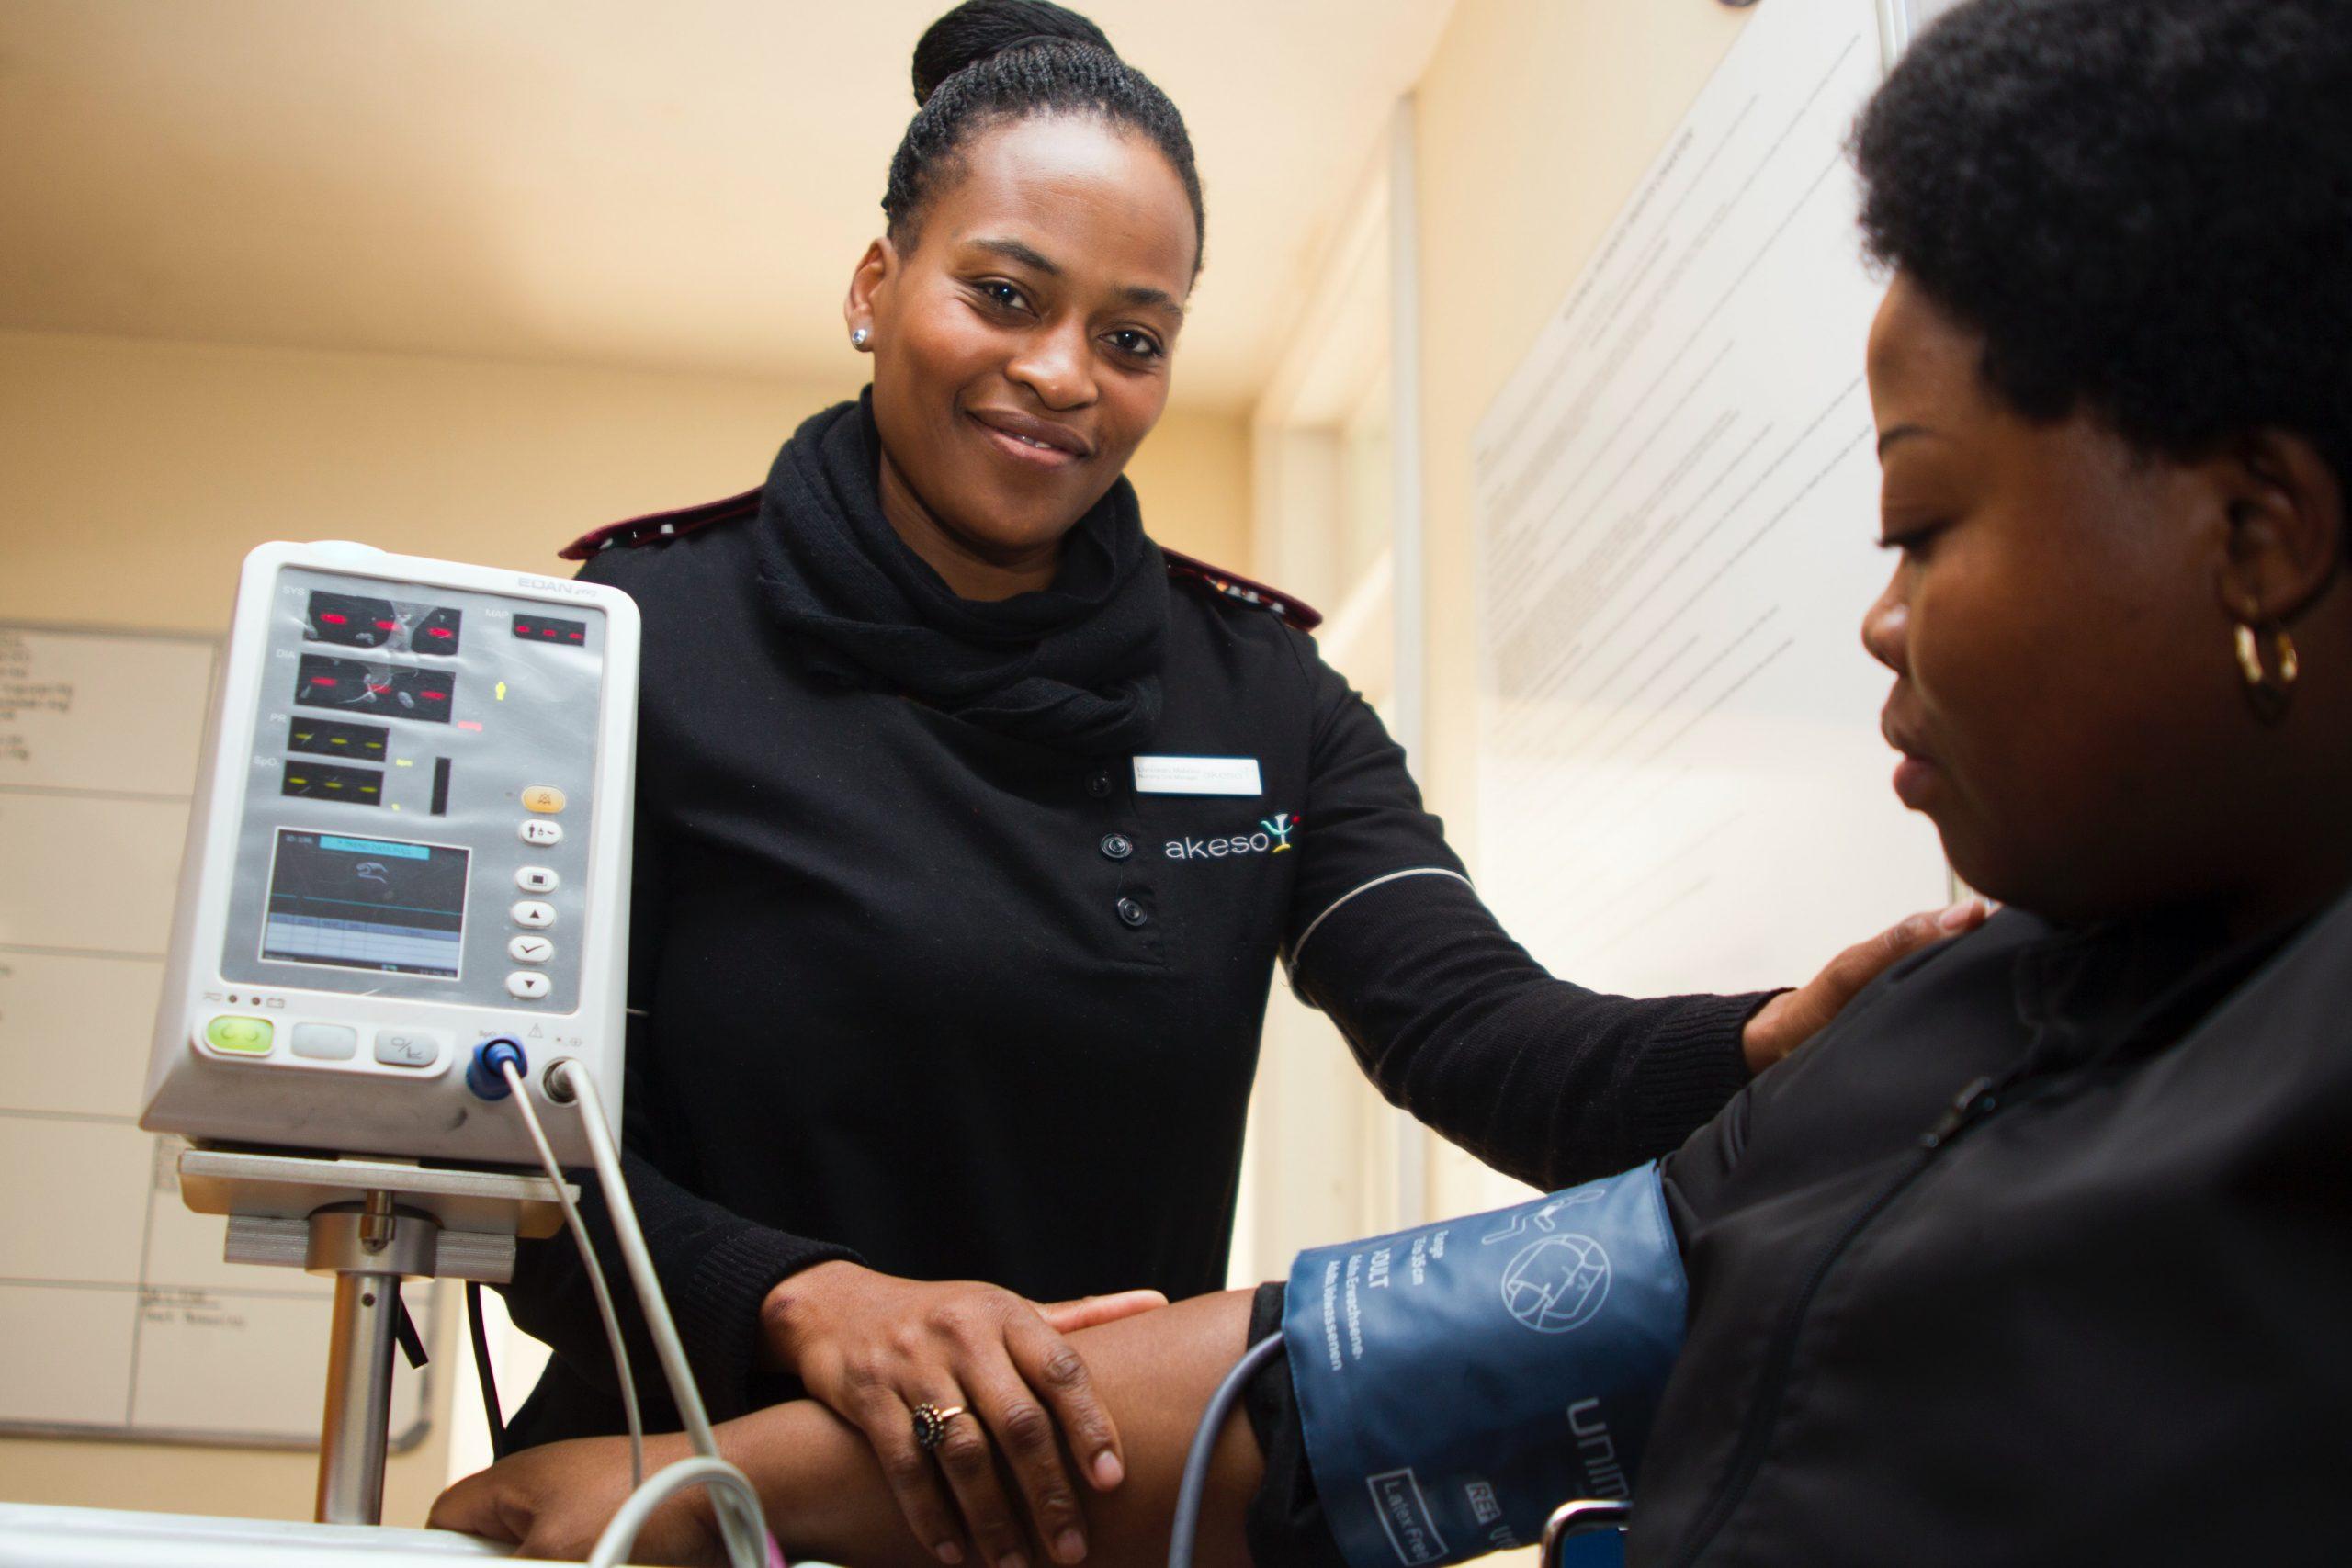 black nurse attends to patient